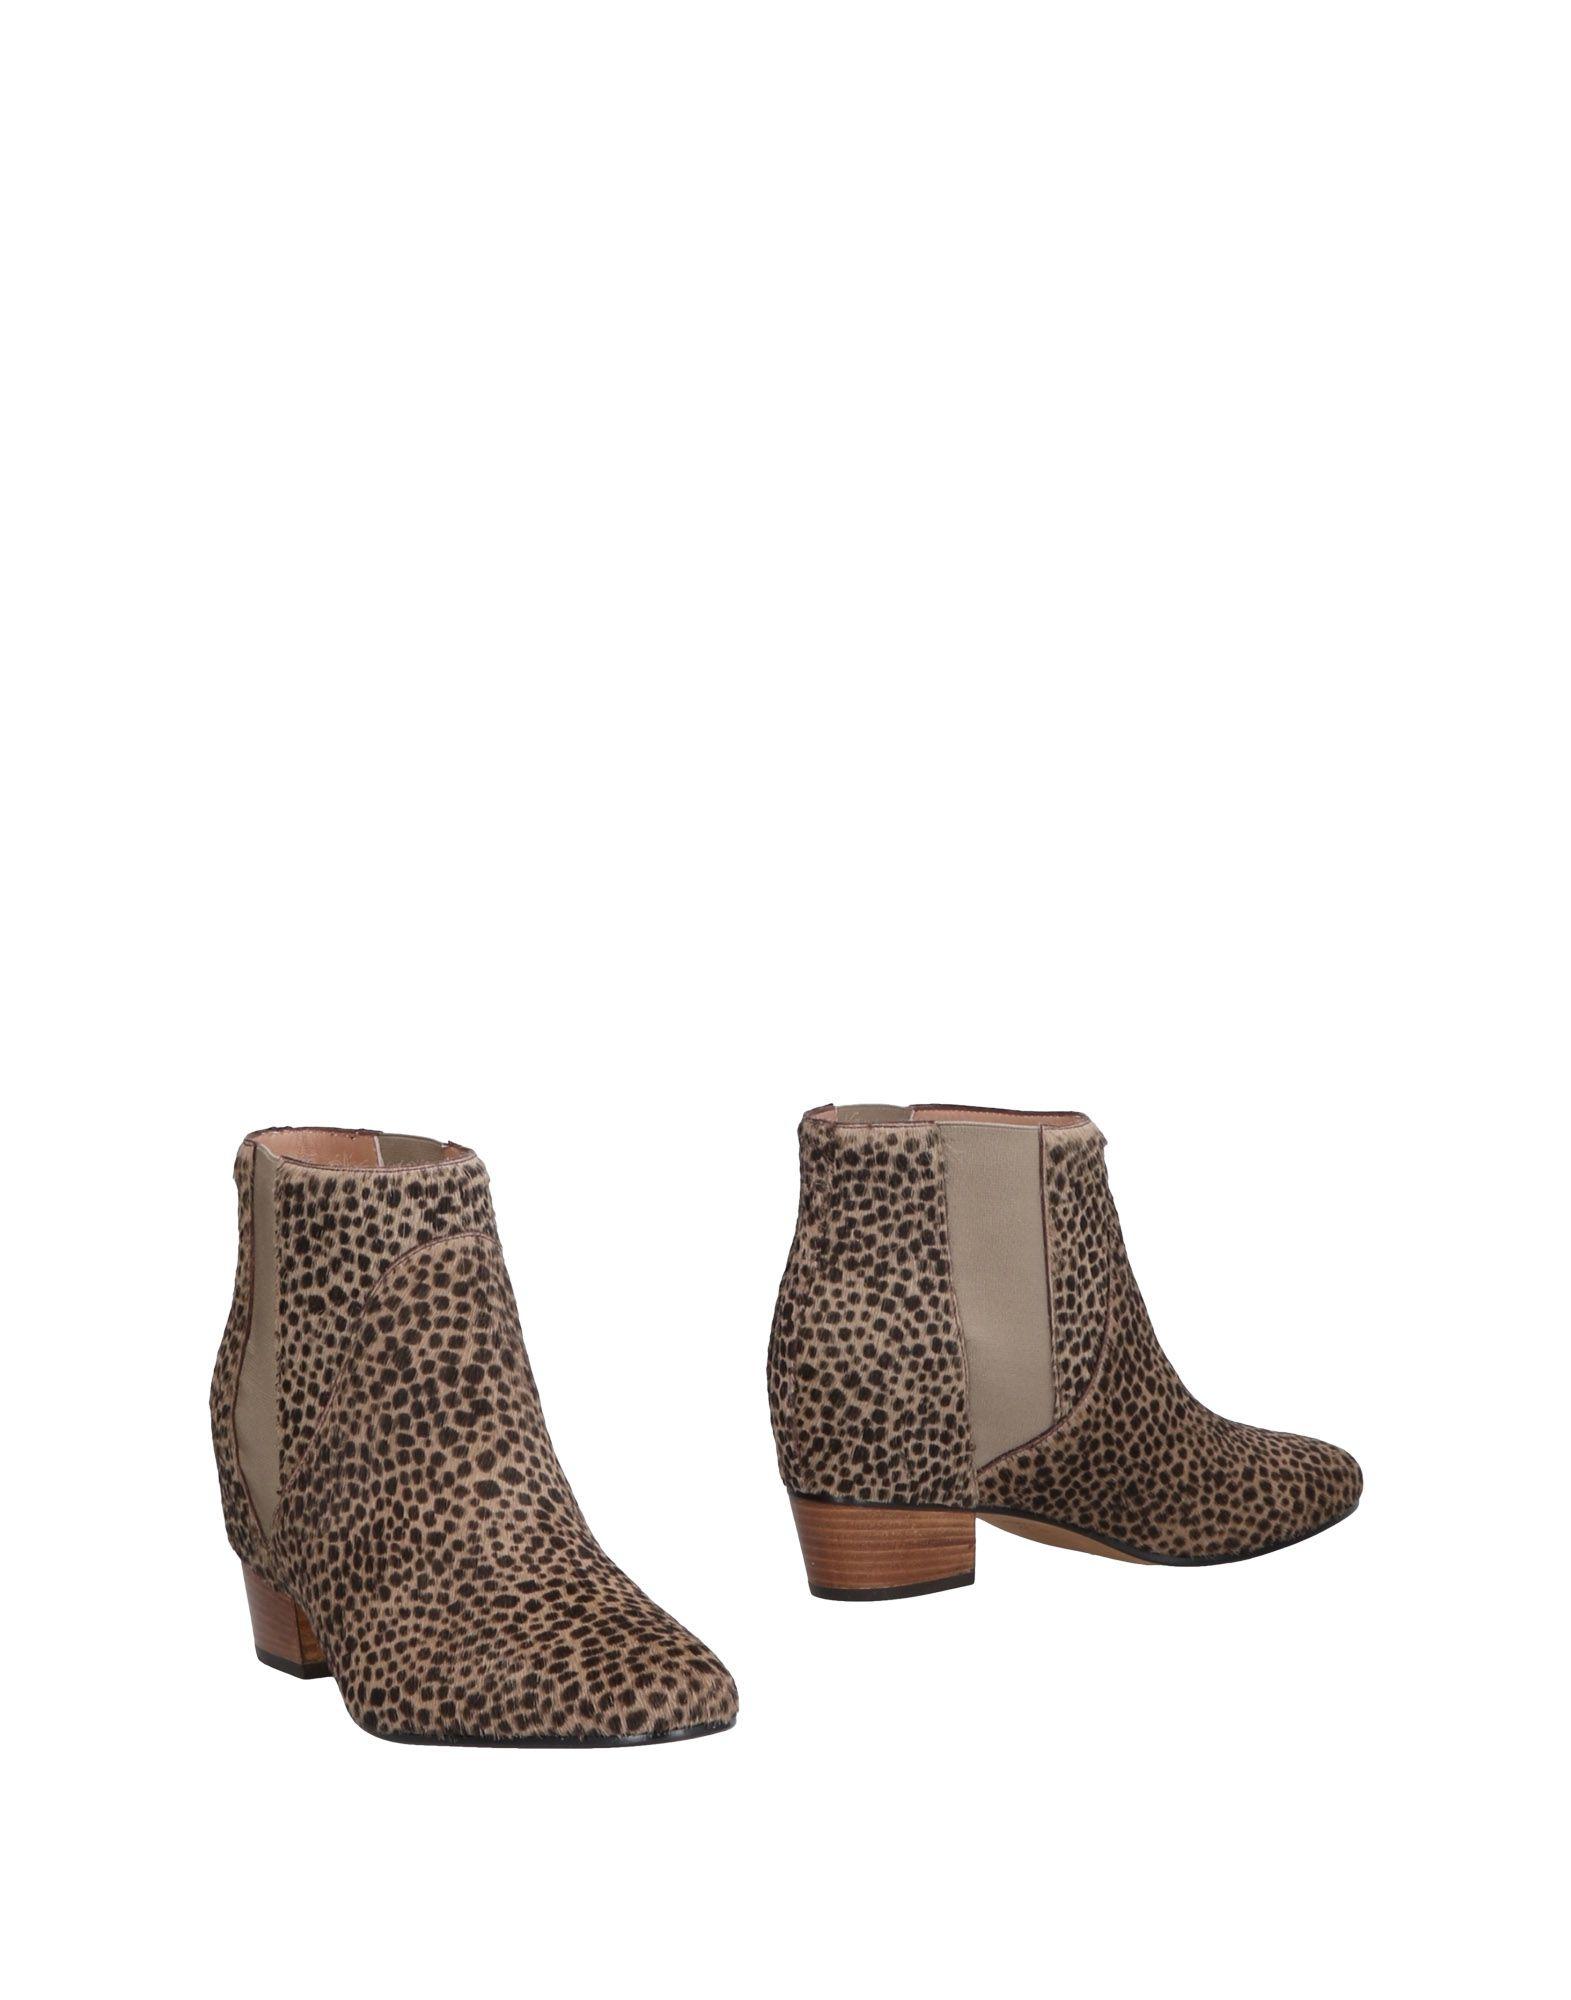 Golden Goose Deluxe Brand Chelsea Boots Damen  11460265GV Heiße Schuhe